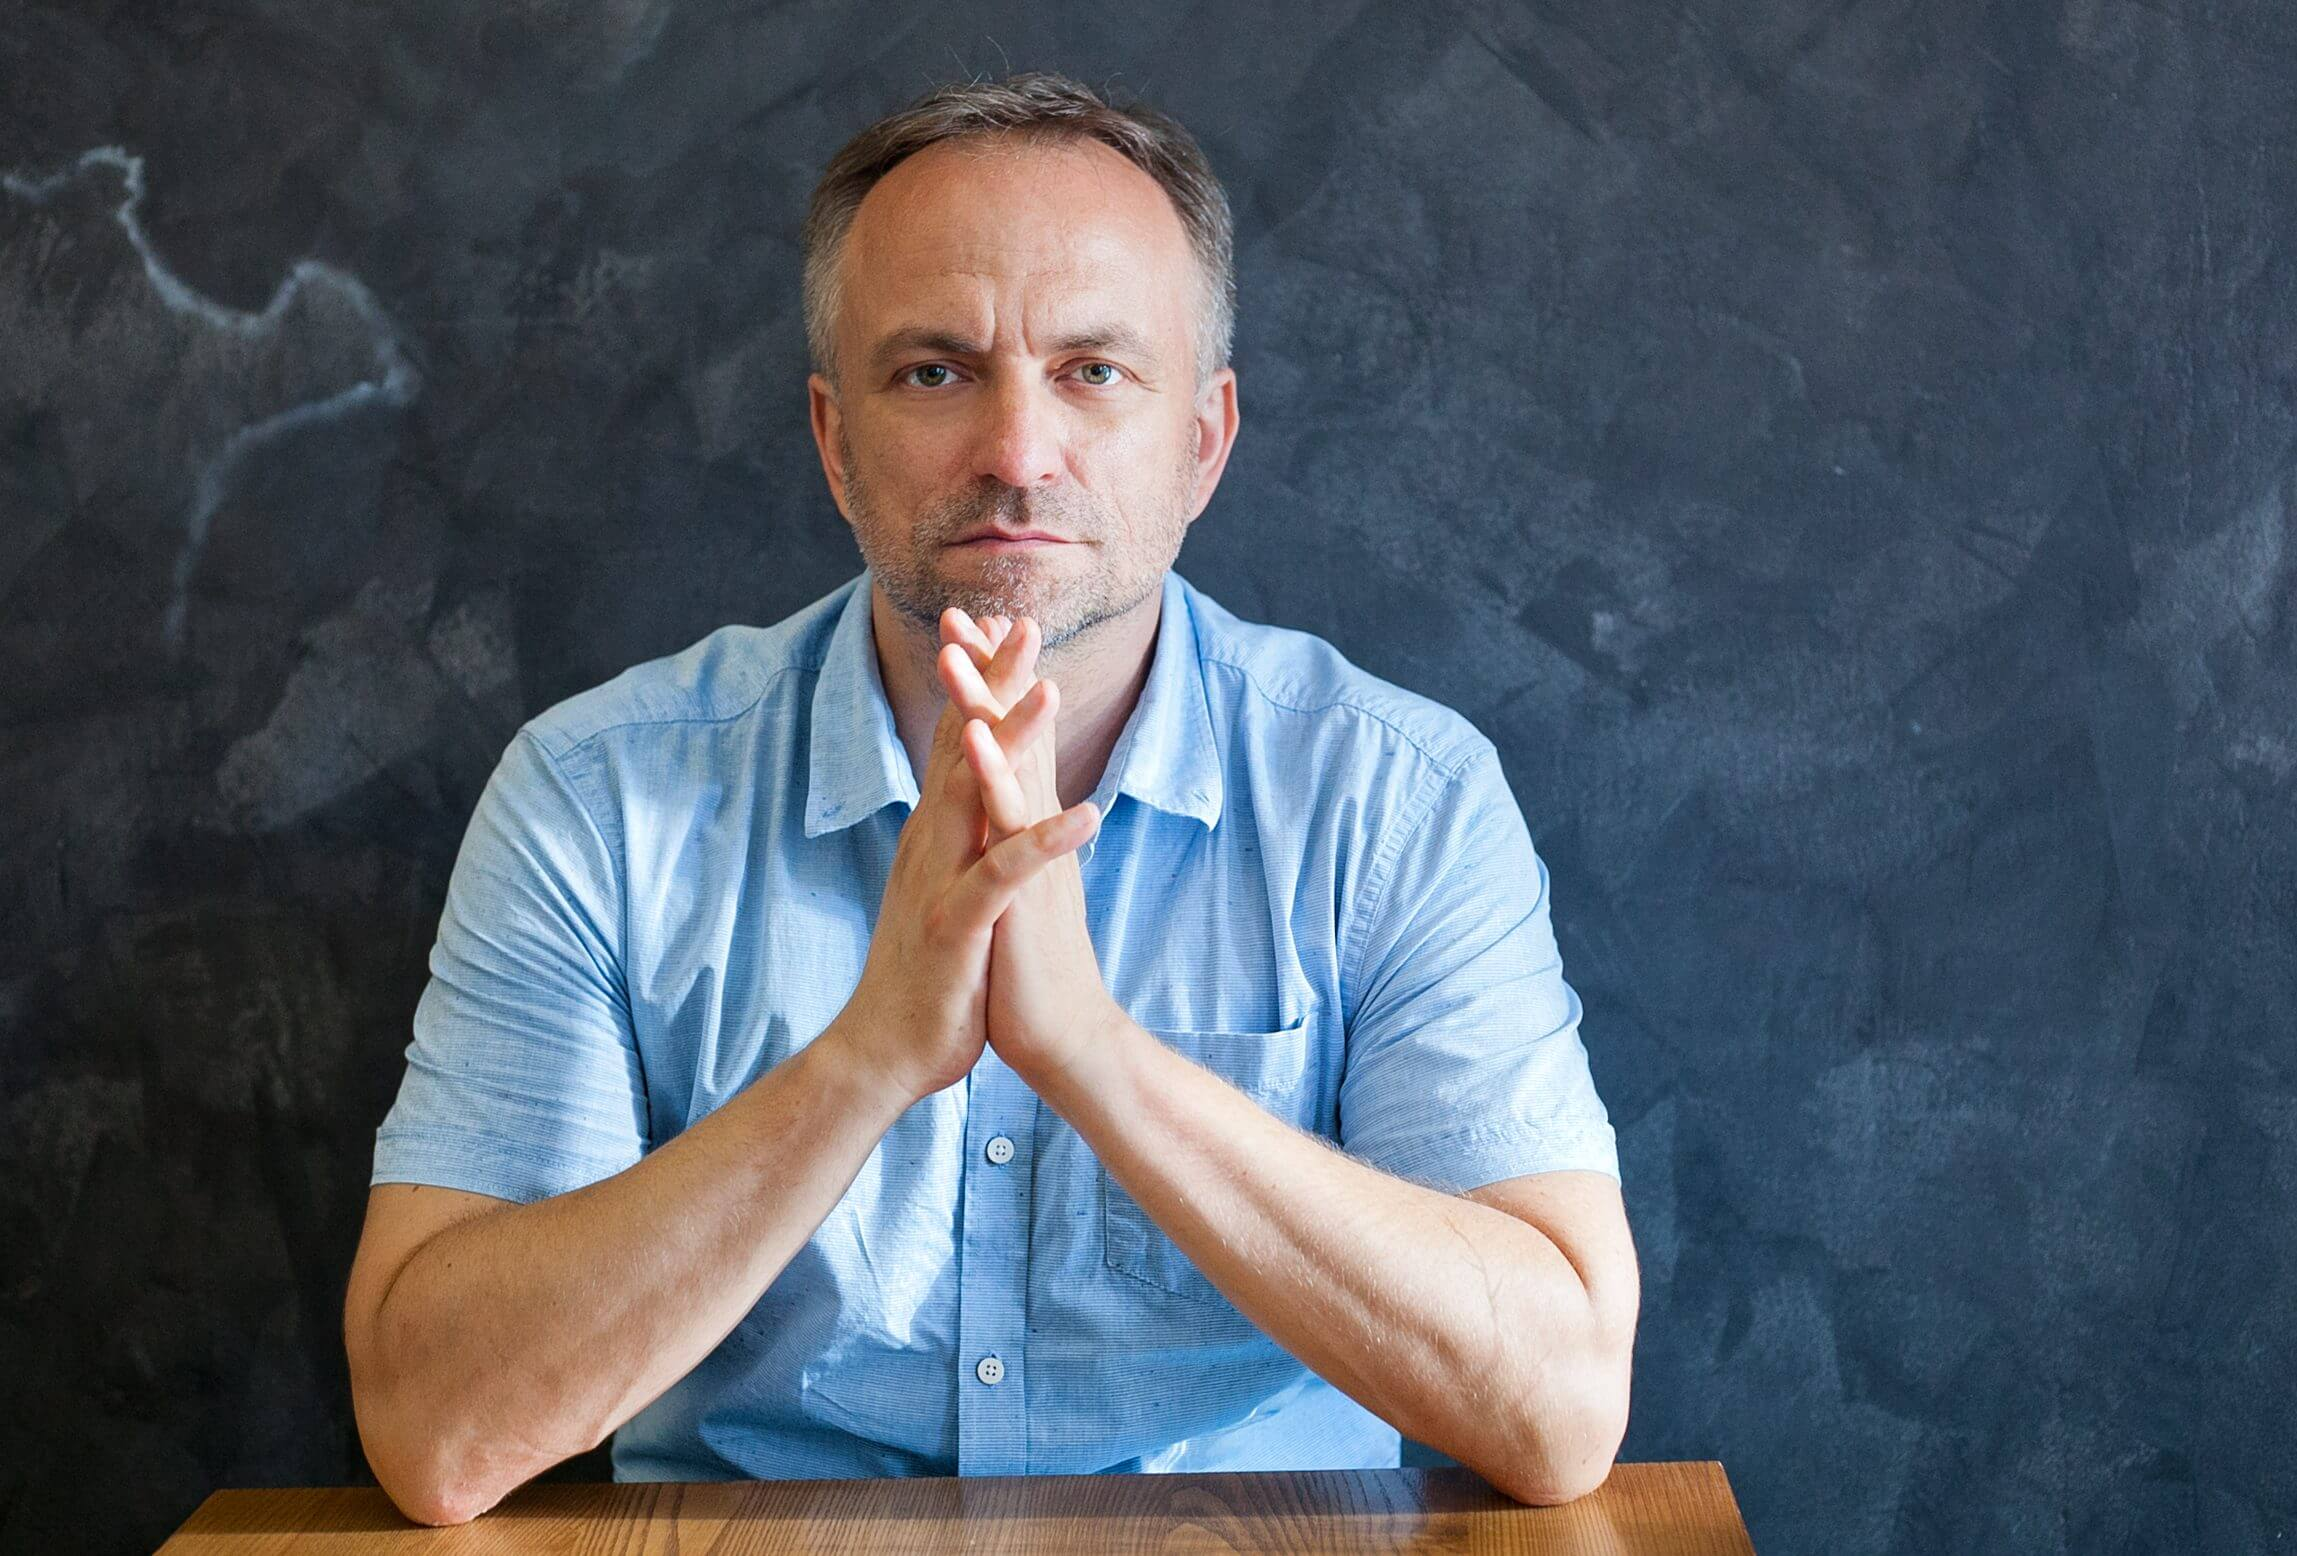 Михаил Жилин, психолог, психотерапевт